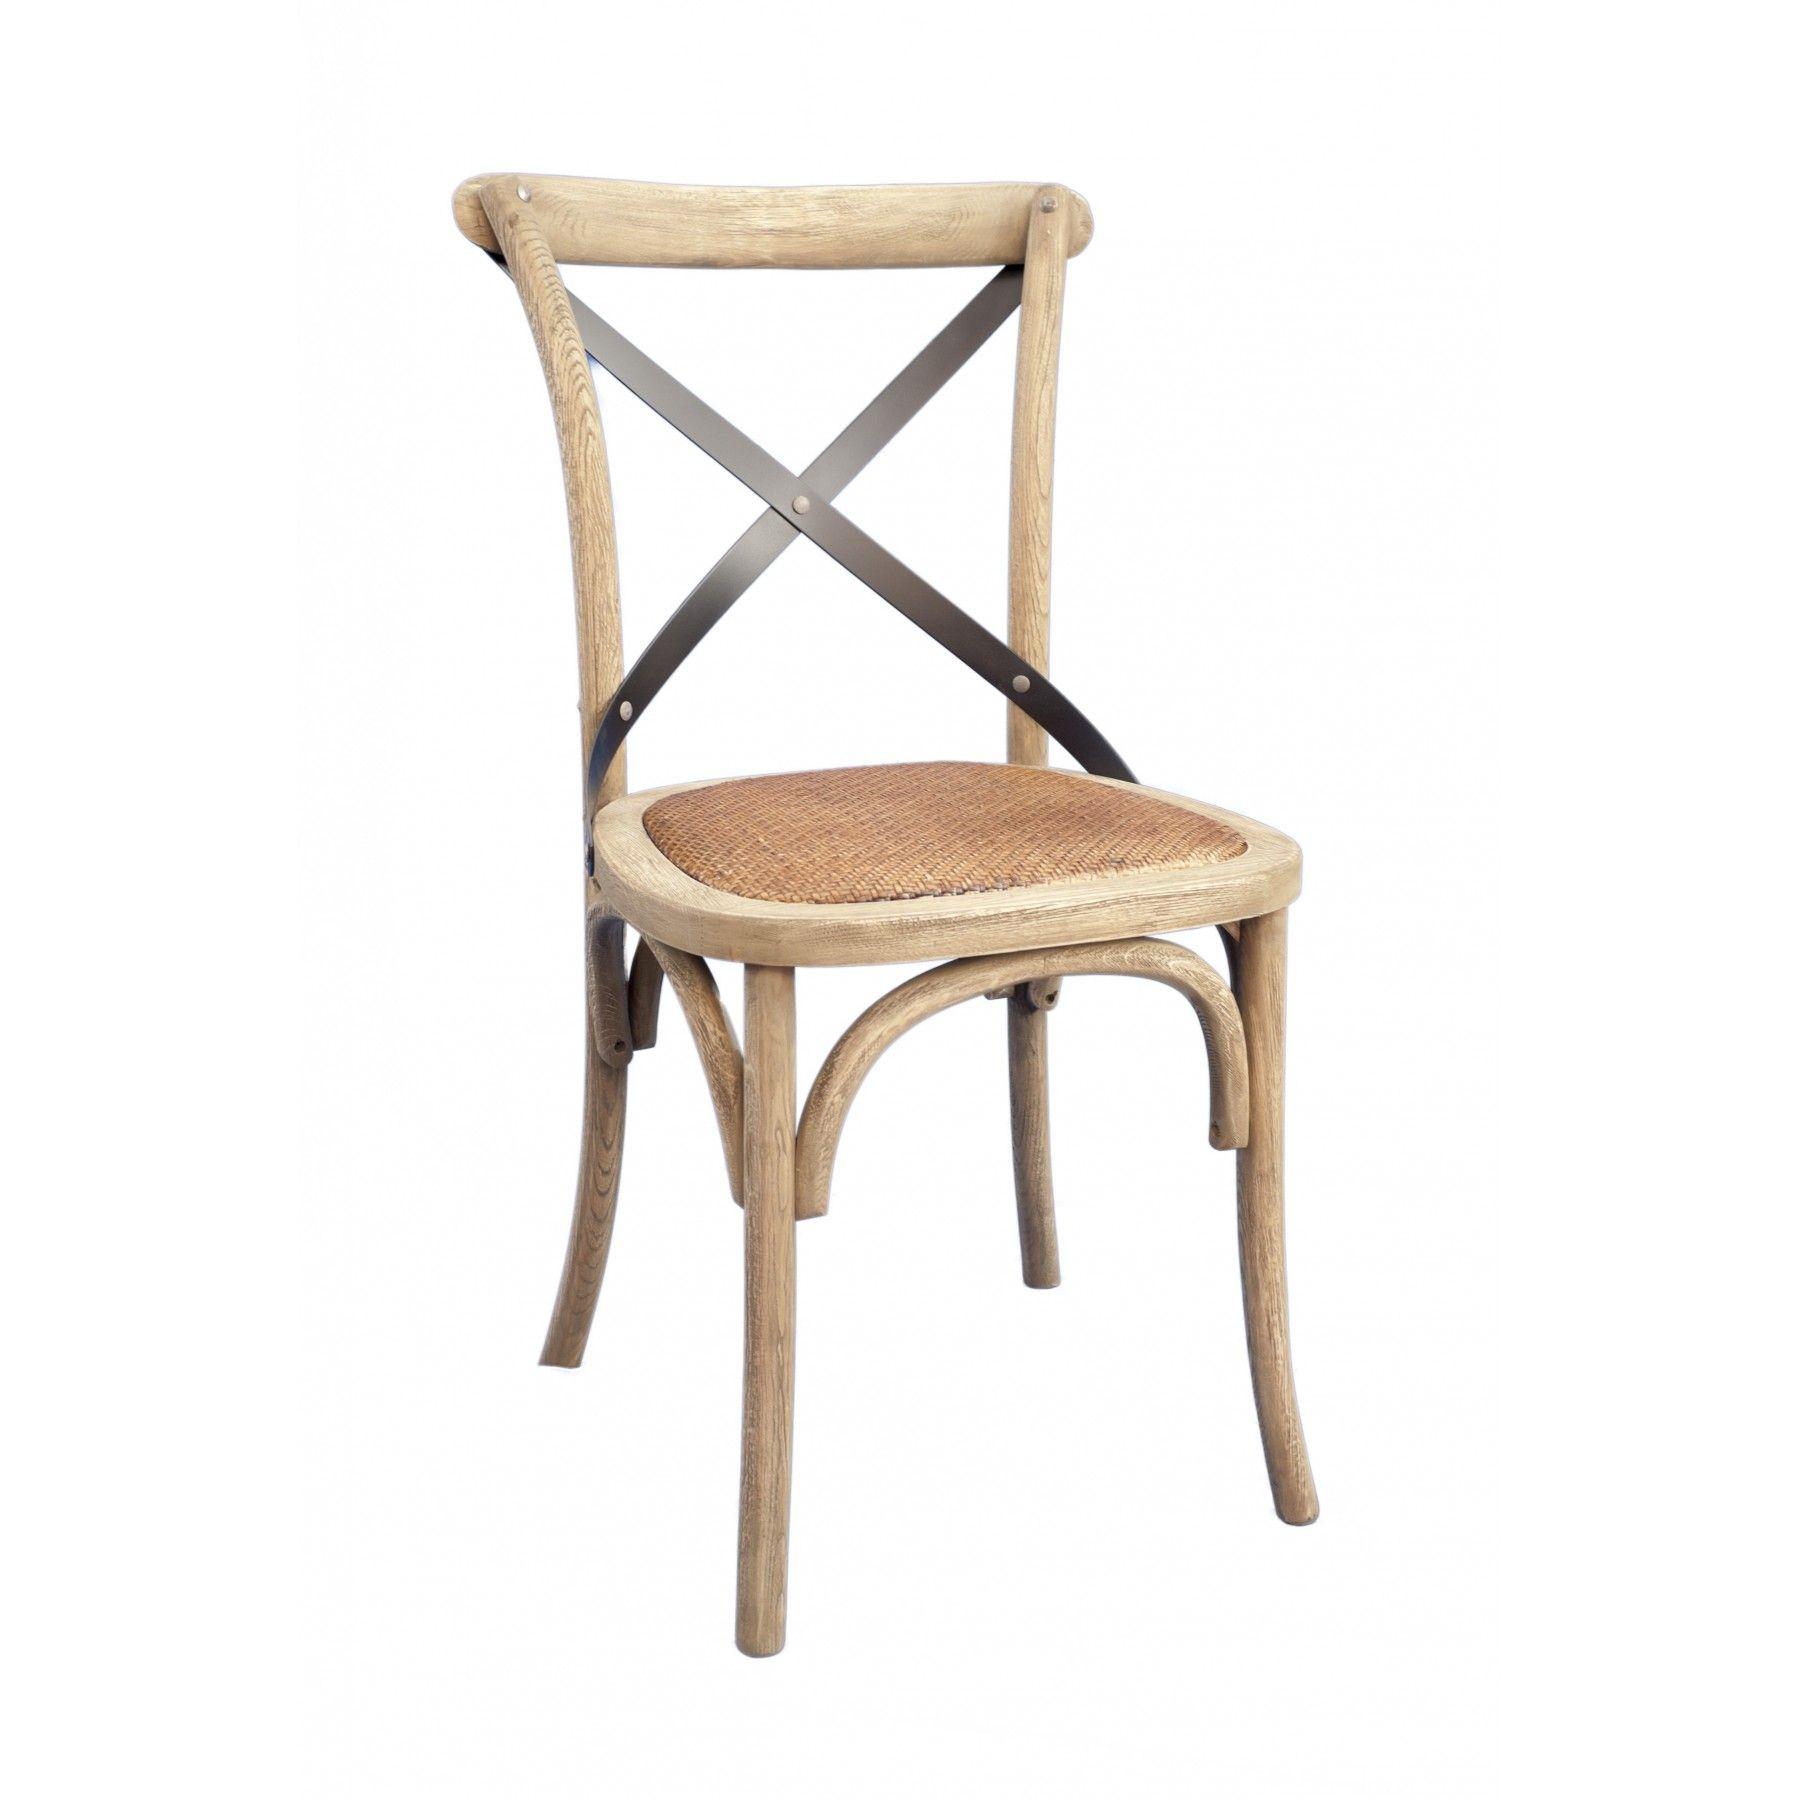 SILLA TONET ROBLE | res sillas / Chairs | Pinterest | Sillas, Roble ...